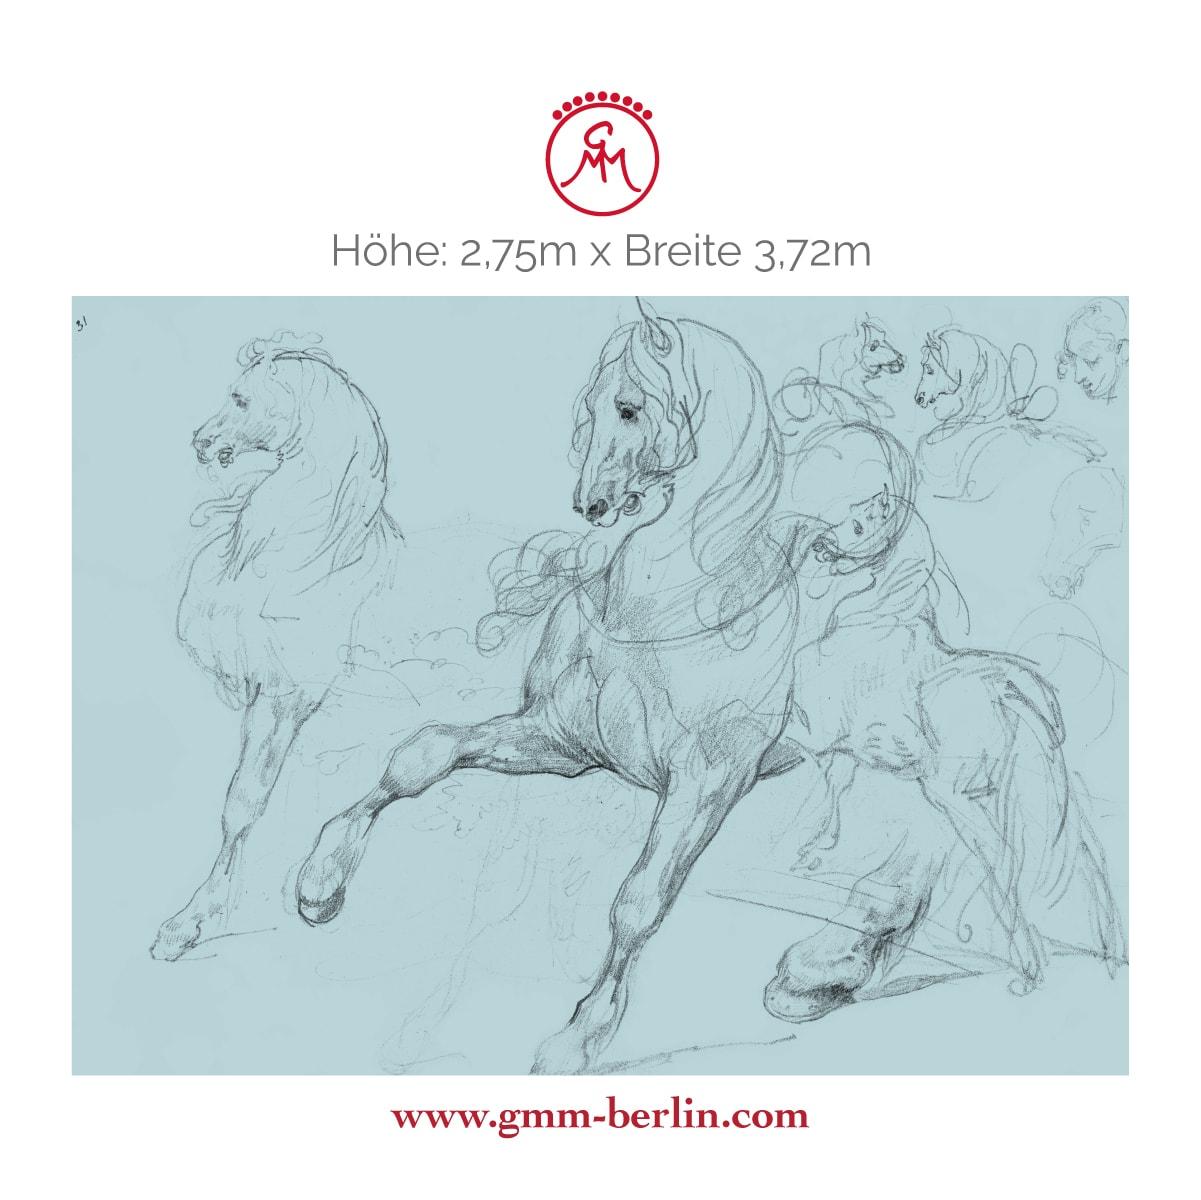 "Exkusive Panoramatapete: Hellblaue Kunst Tapete ""Pferde Studien"" nach Théodore Géricault"